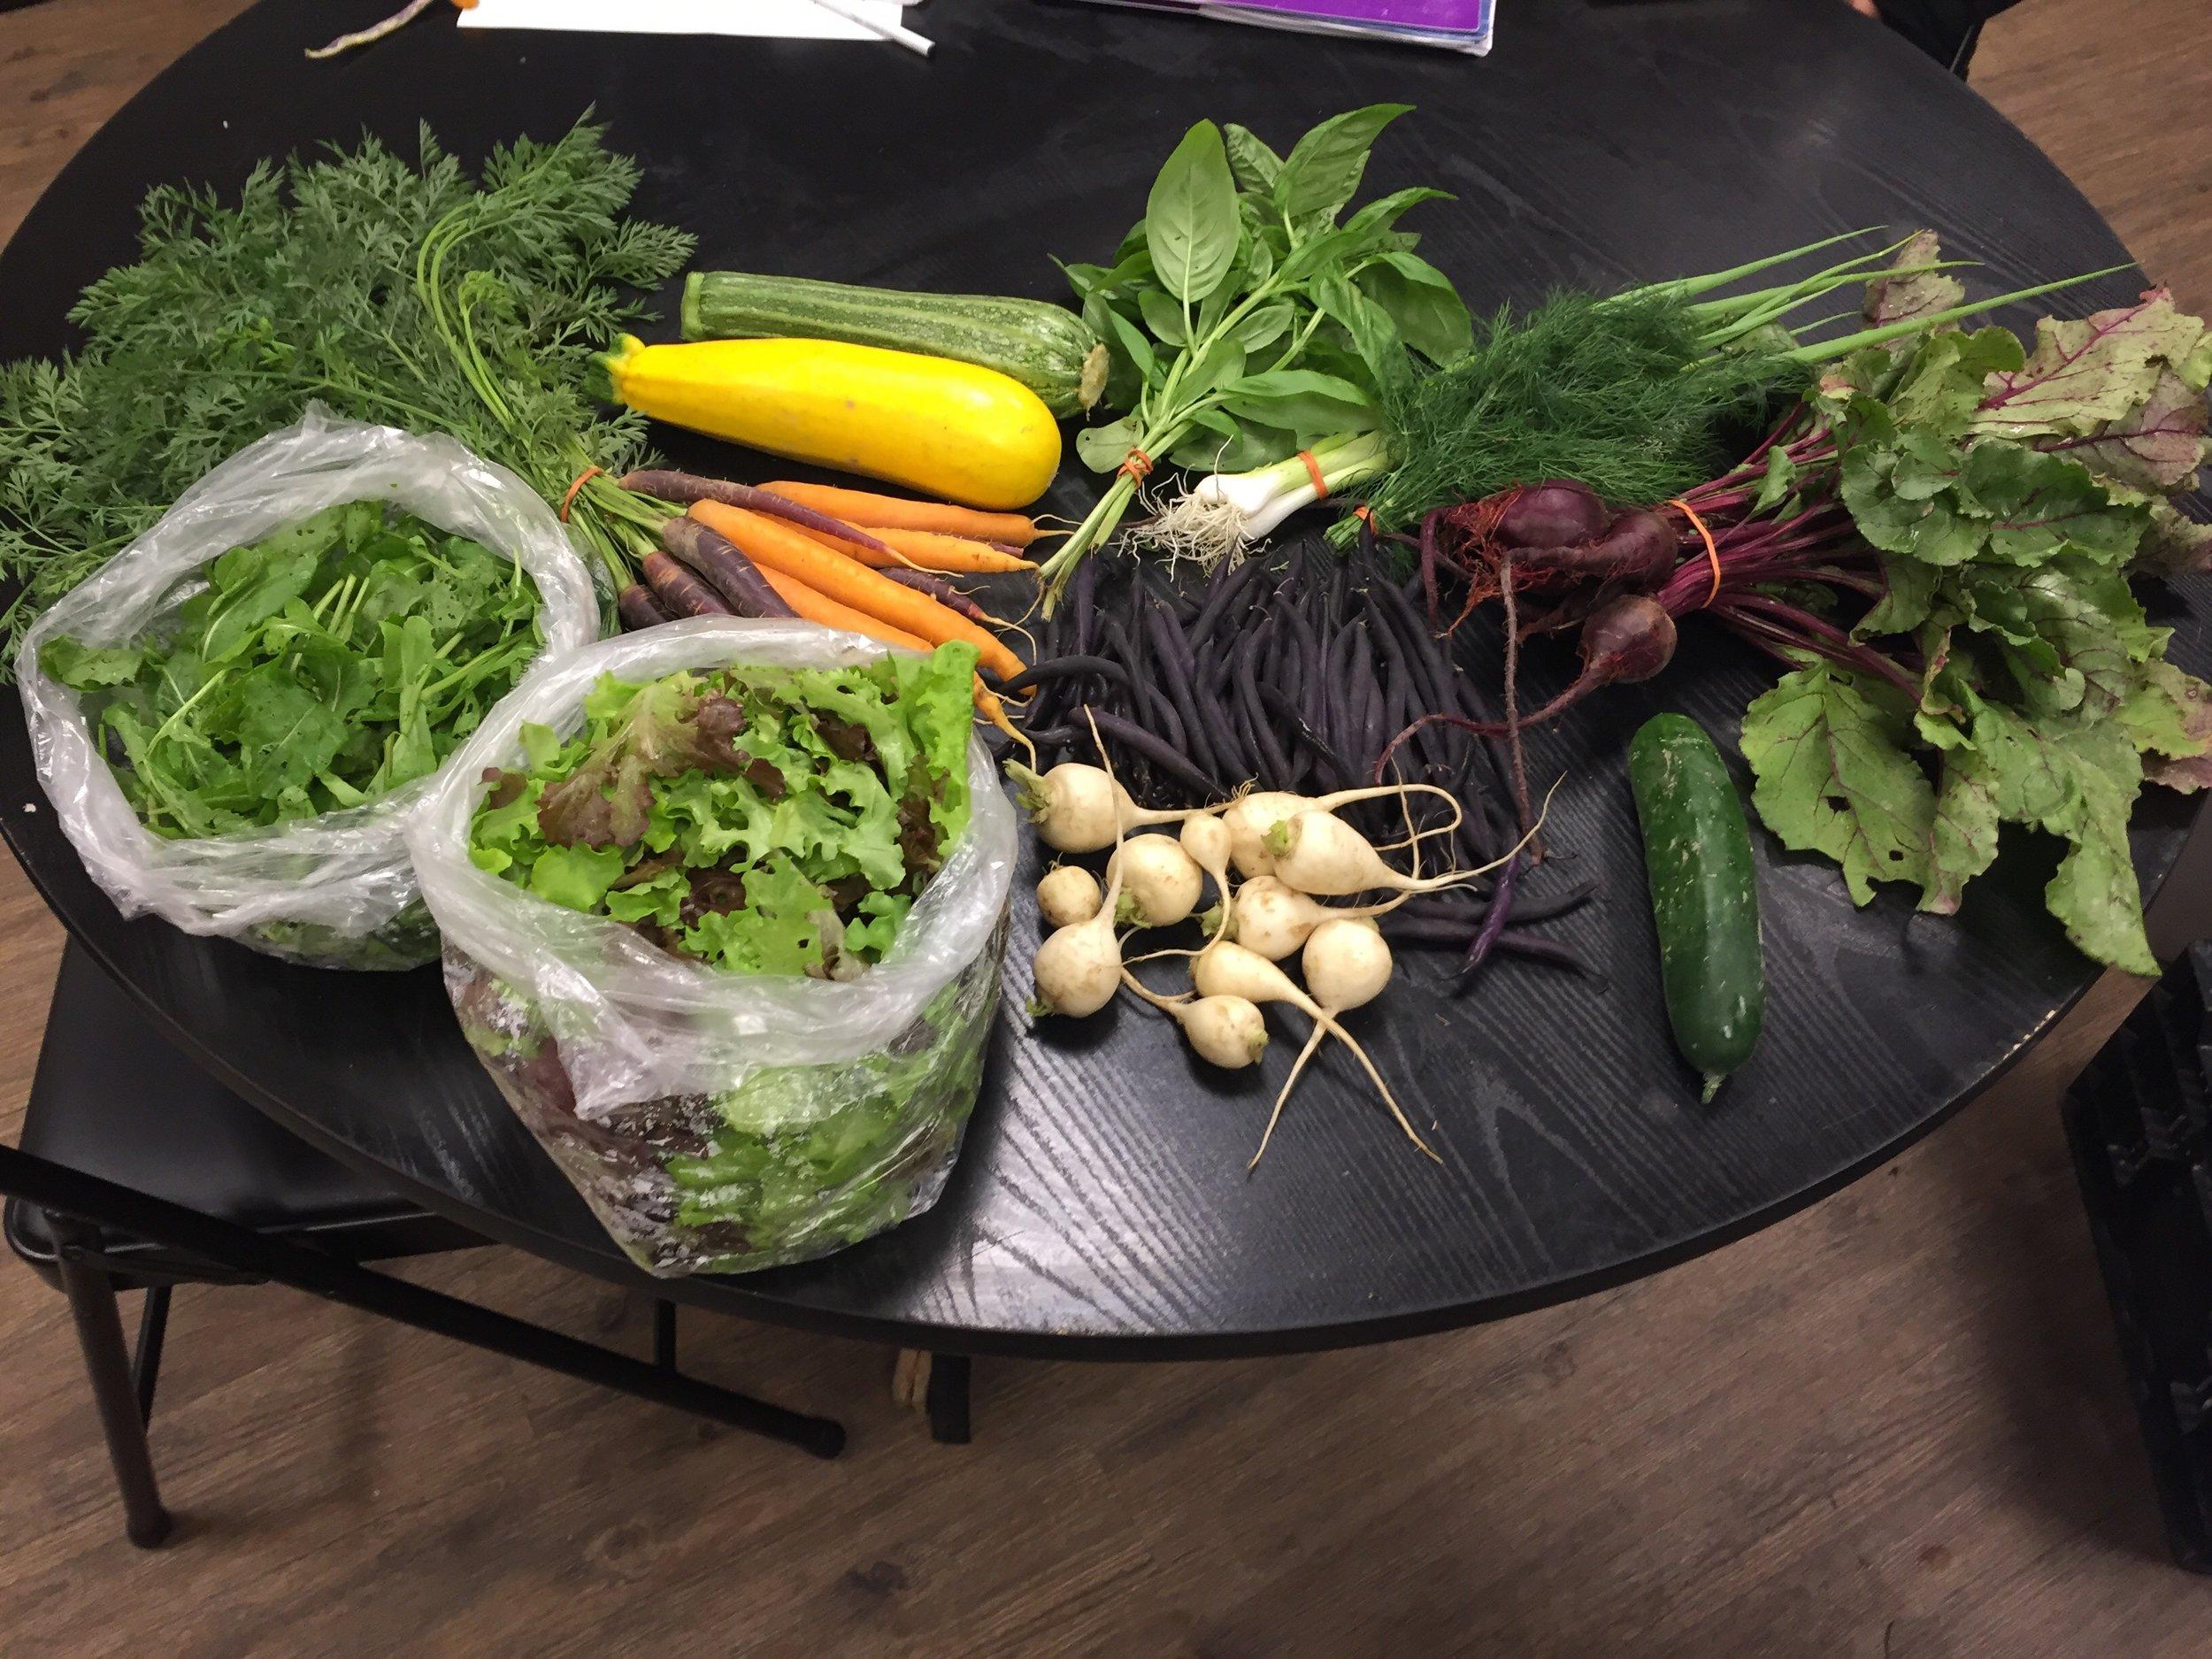 Early Season Share - Purple beans, beets, green onions, basil, dill, rainbow carrots, arugula, leaf lettuce mix, cucumber, salad turnip and zucchini